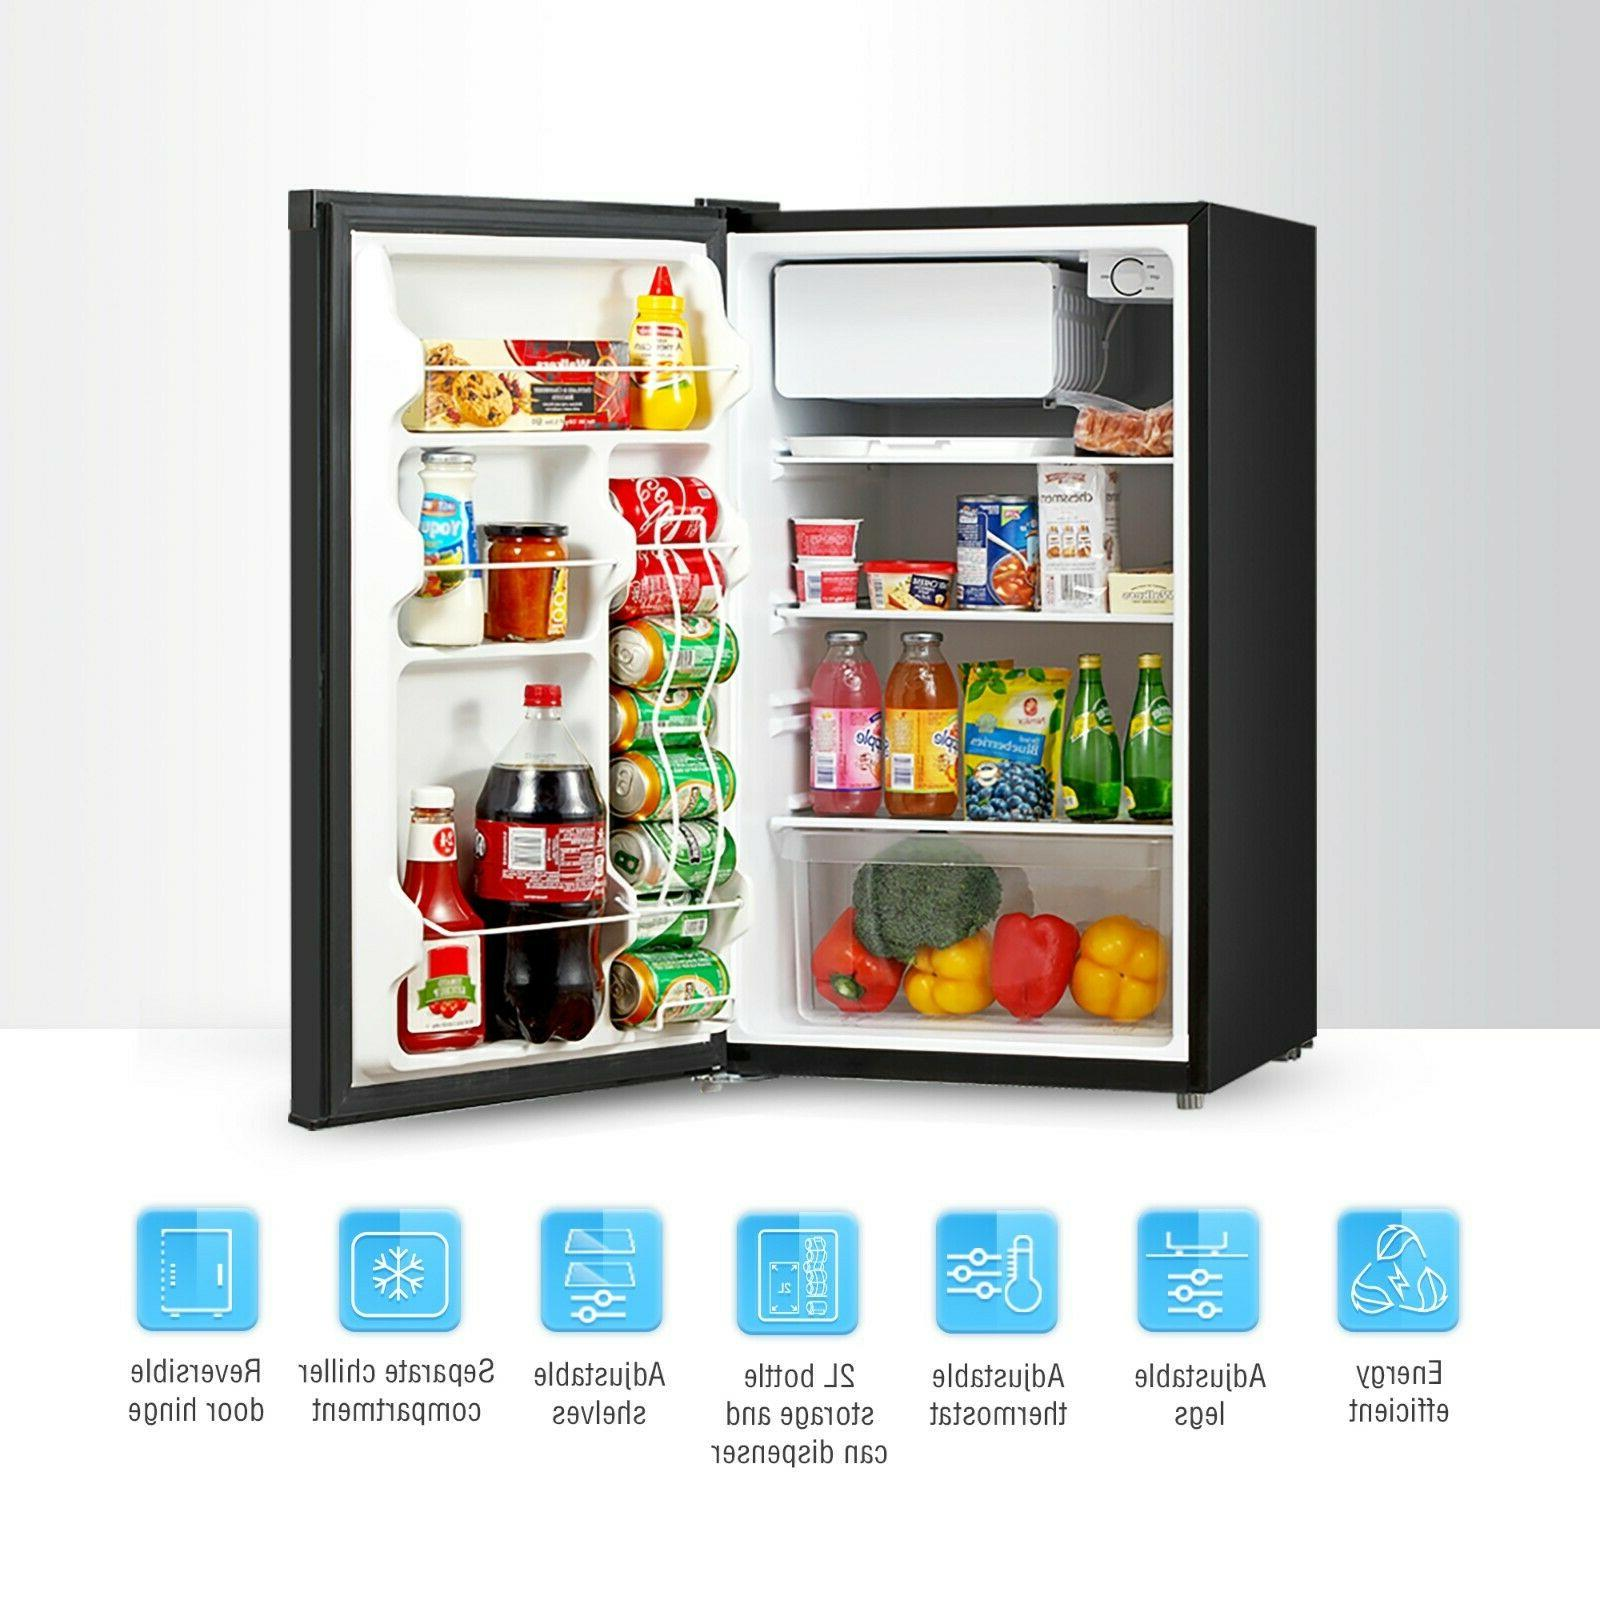 4.4 Fridge Compact Refrigerator Separate